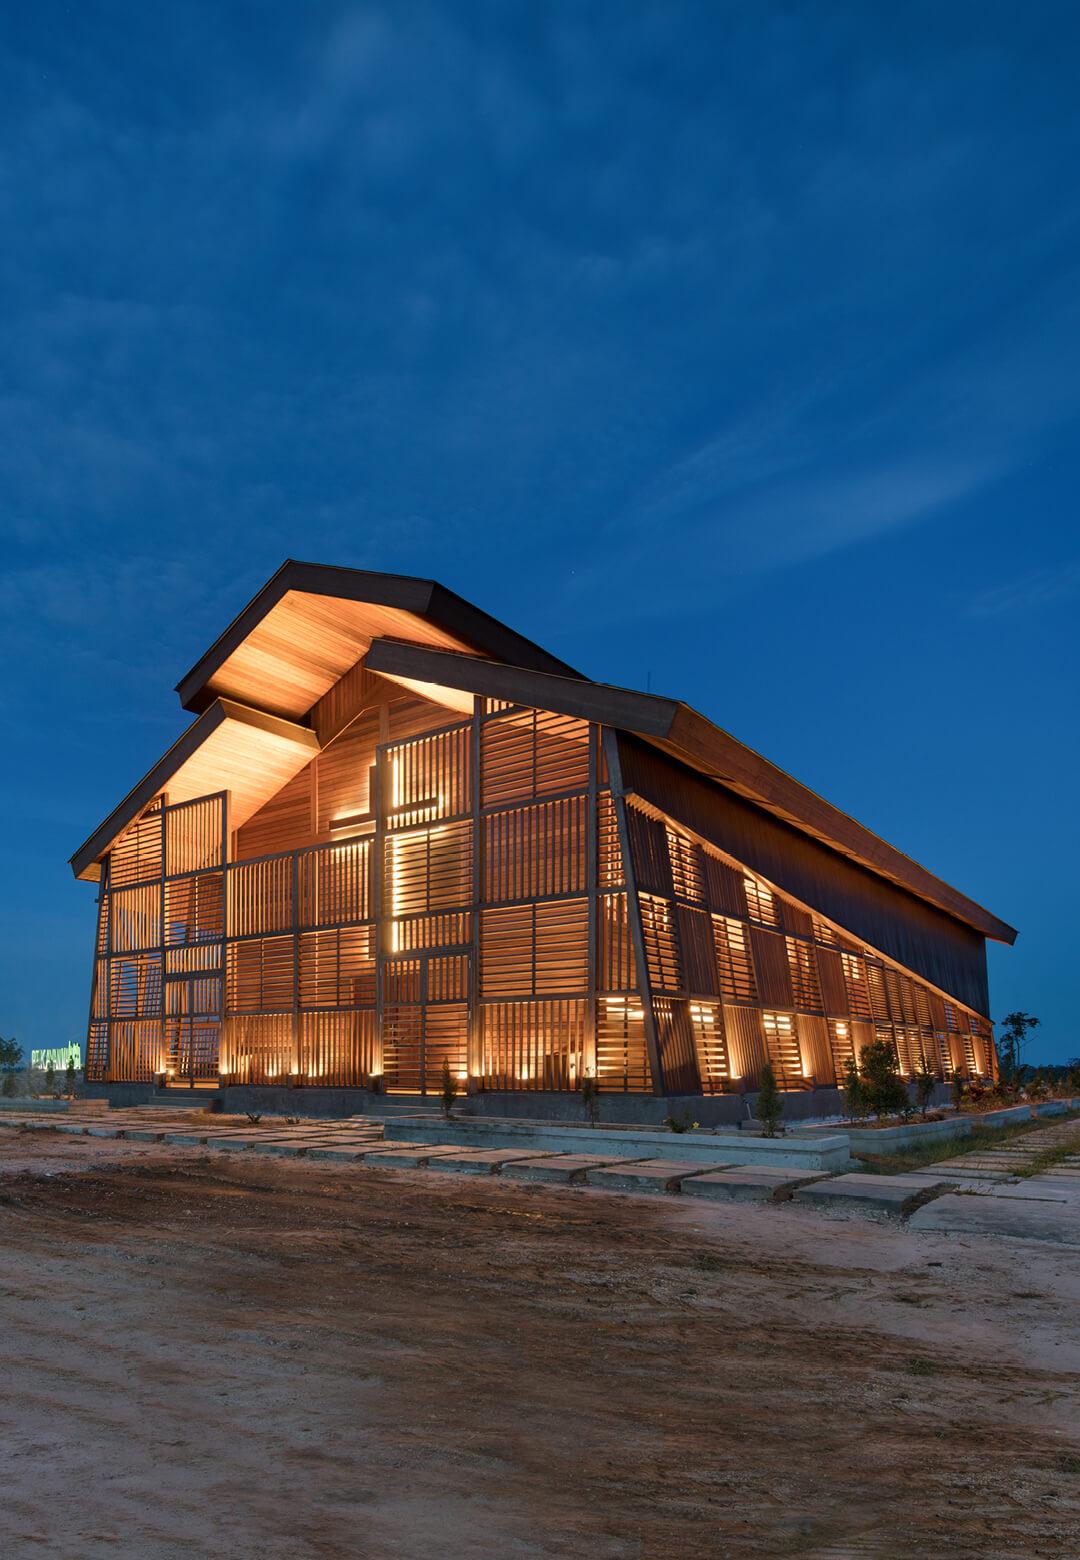 The Oikumene Church designed by TSDS Interior Architects in Indonesia | Oikumene Church | TSDS Interior Architects | STIRworld